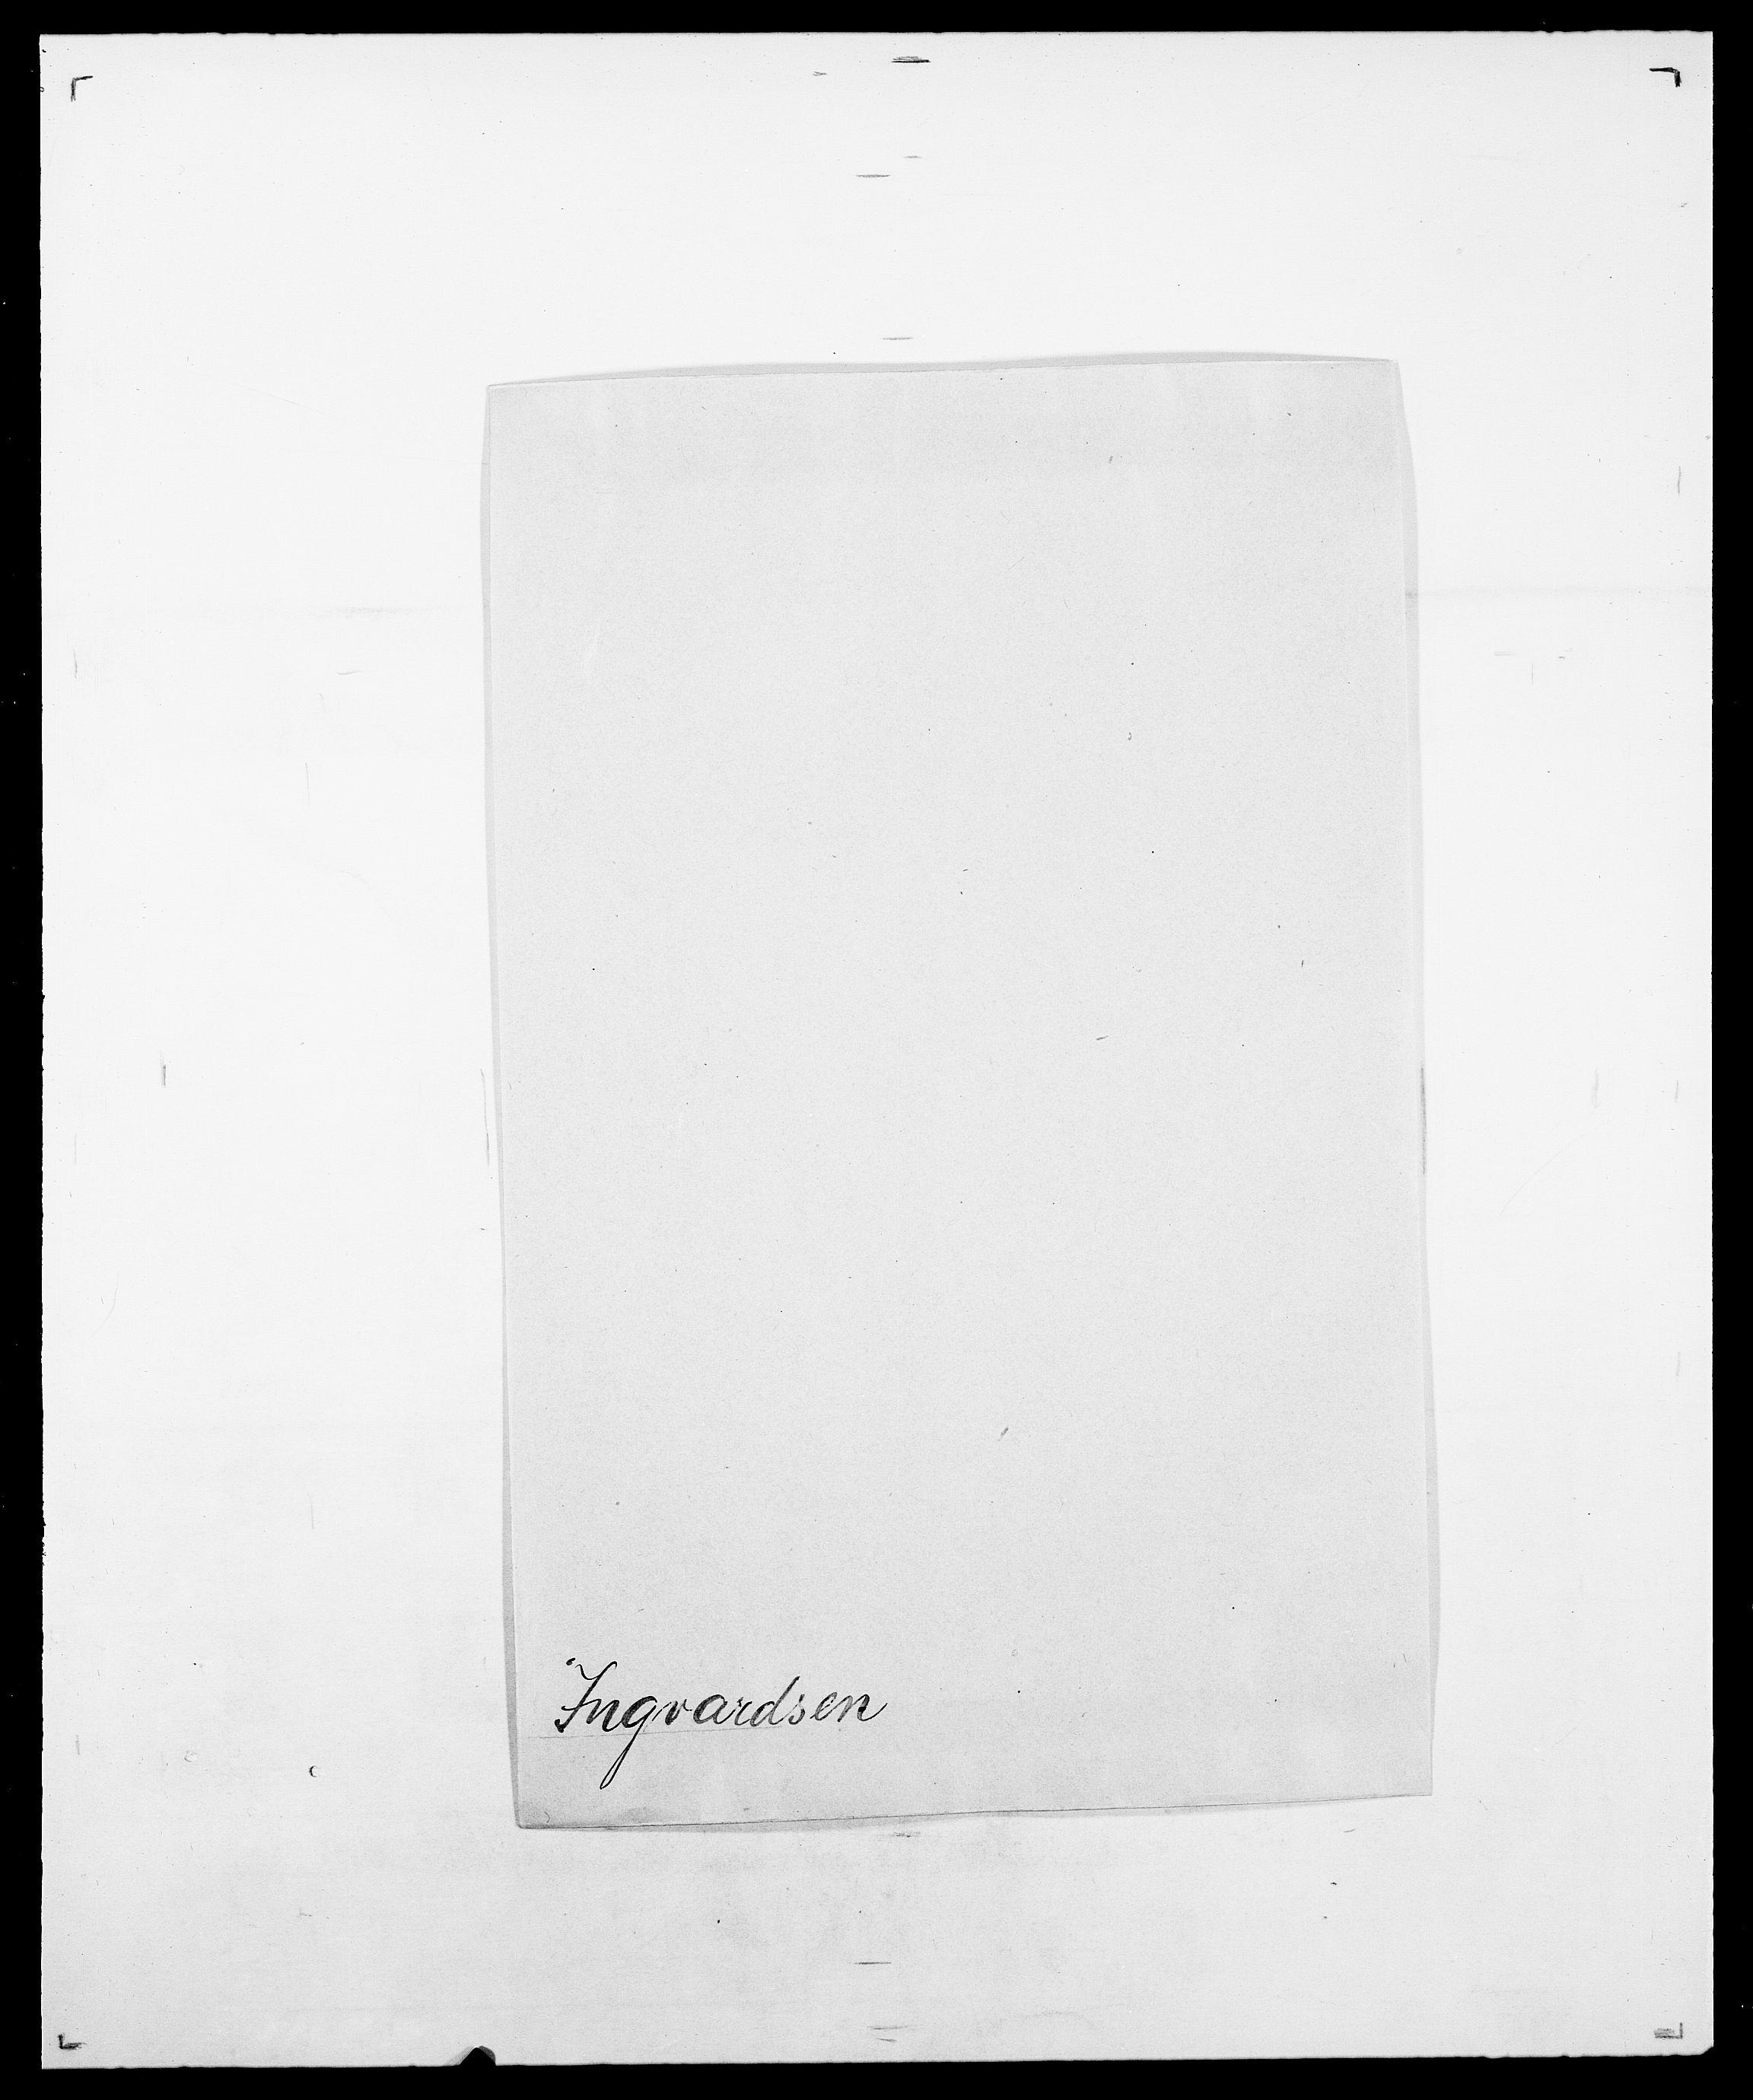 SAO, Delgobe, Charles Antoine - samling, D/Da/L0019: van der Hude - Joys, s. 798